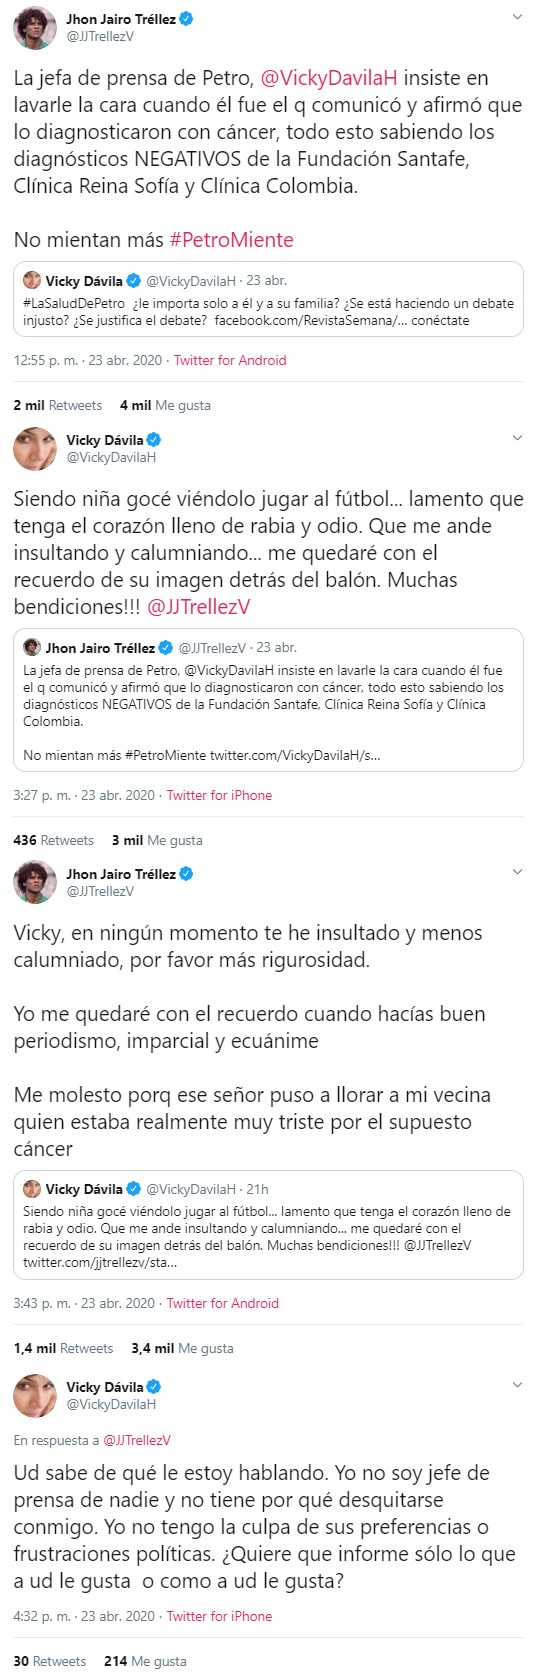 Vicky Dávila, Jhon Jairo Tréllez, discusión, Gustavo Petro, Twitter